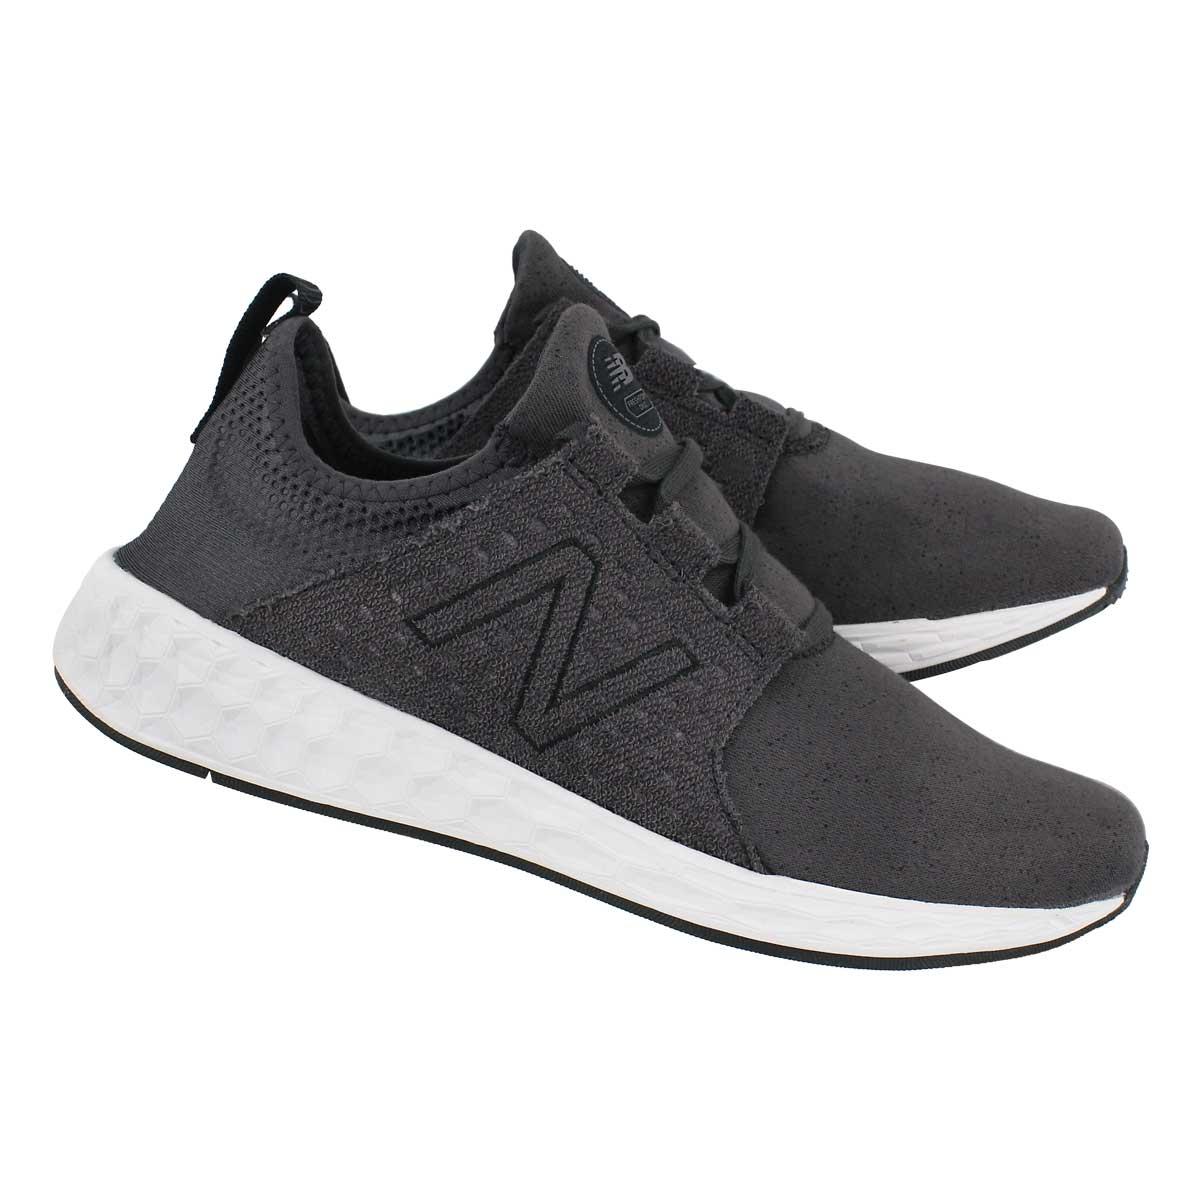 Mns Cruz black slip-on sneaker